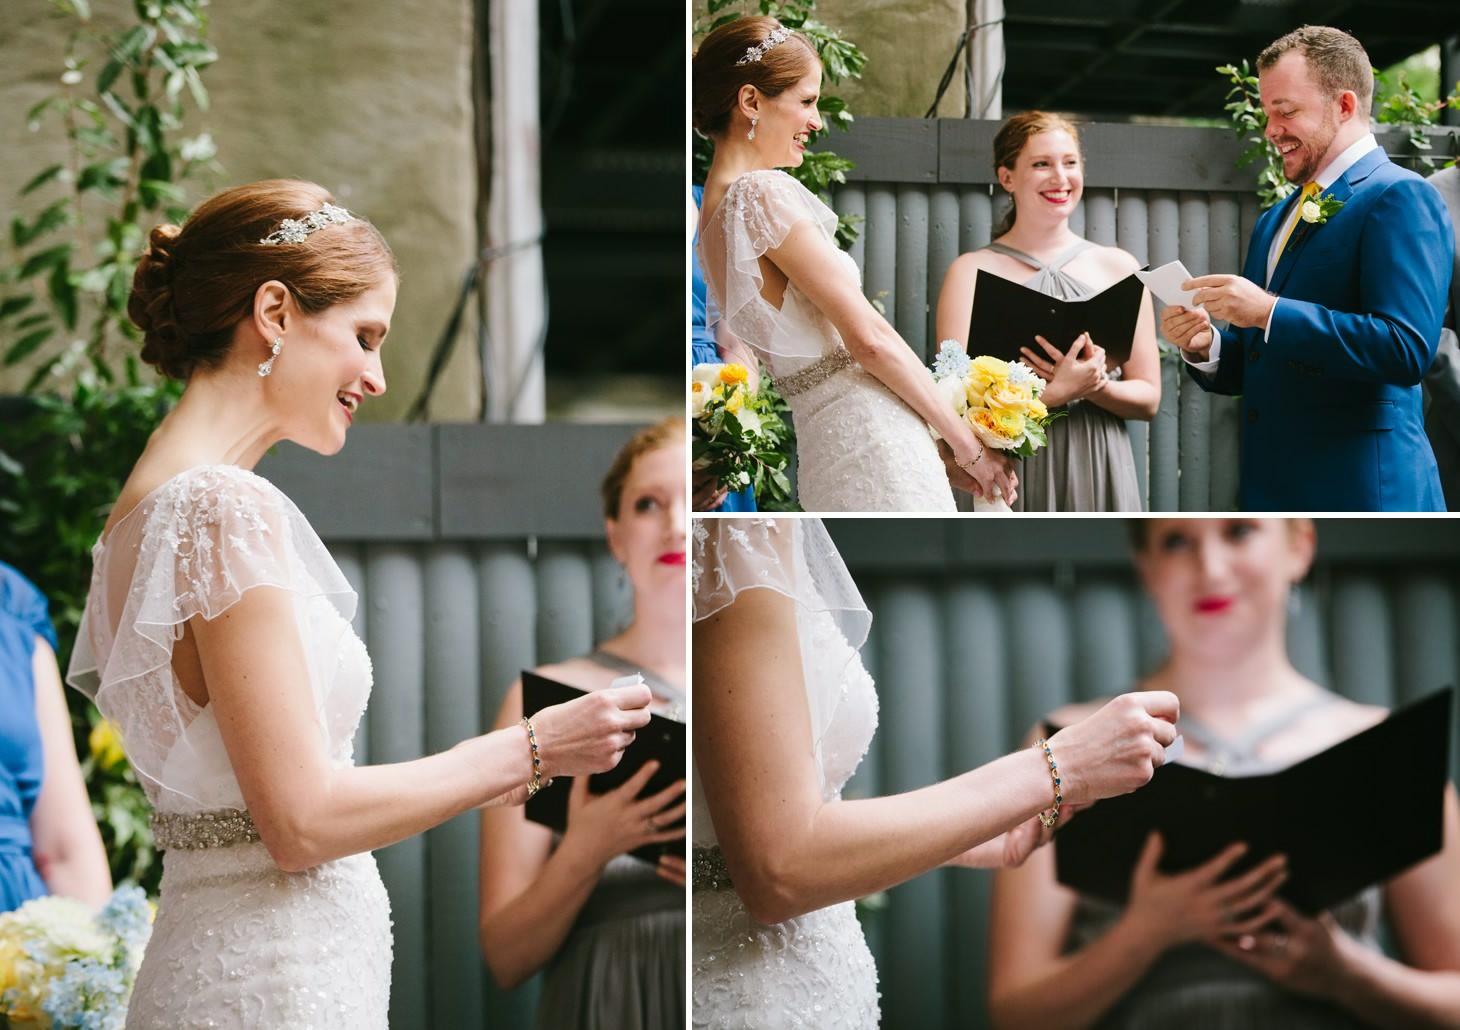 brooklyn-restaurant-wedding-nyc-weddingi-photographer-smitten-chickens04.jpg